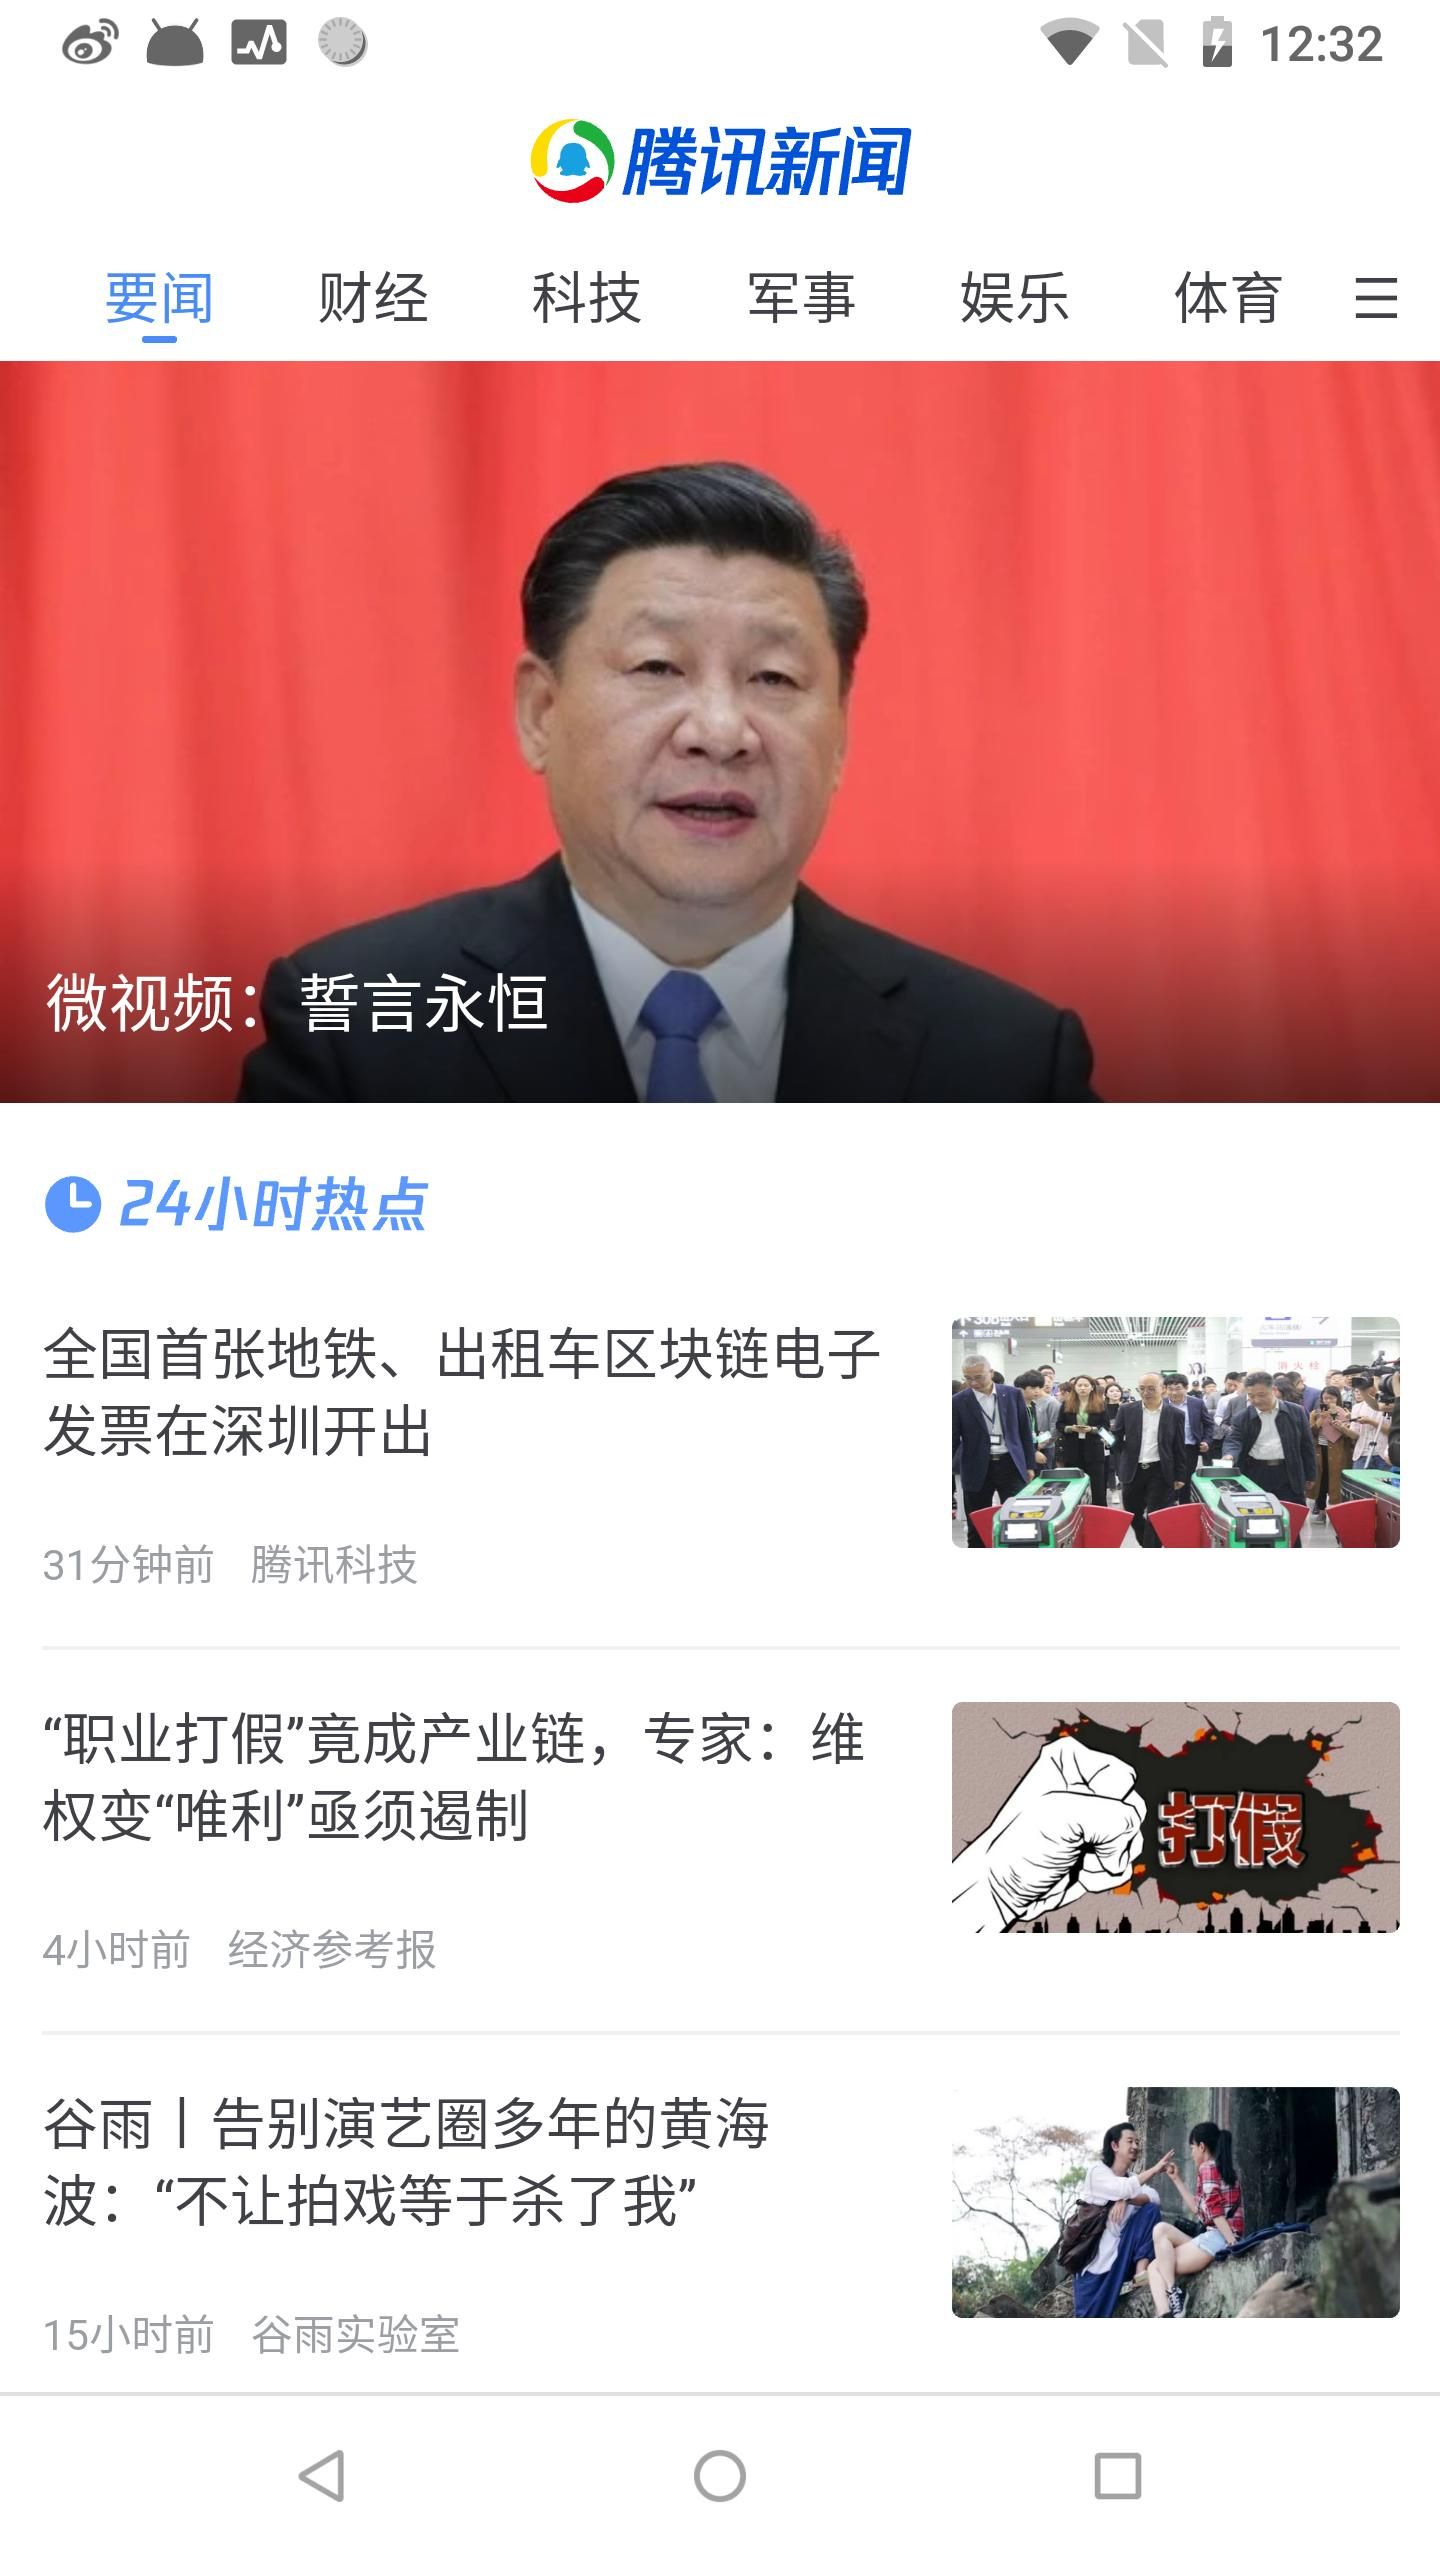 Tencent News